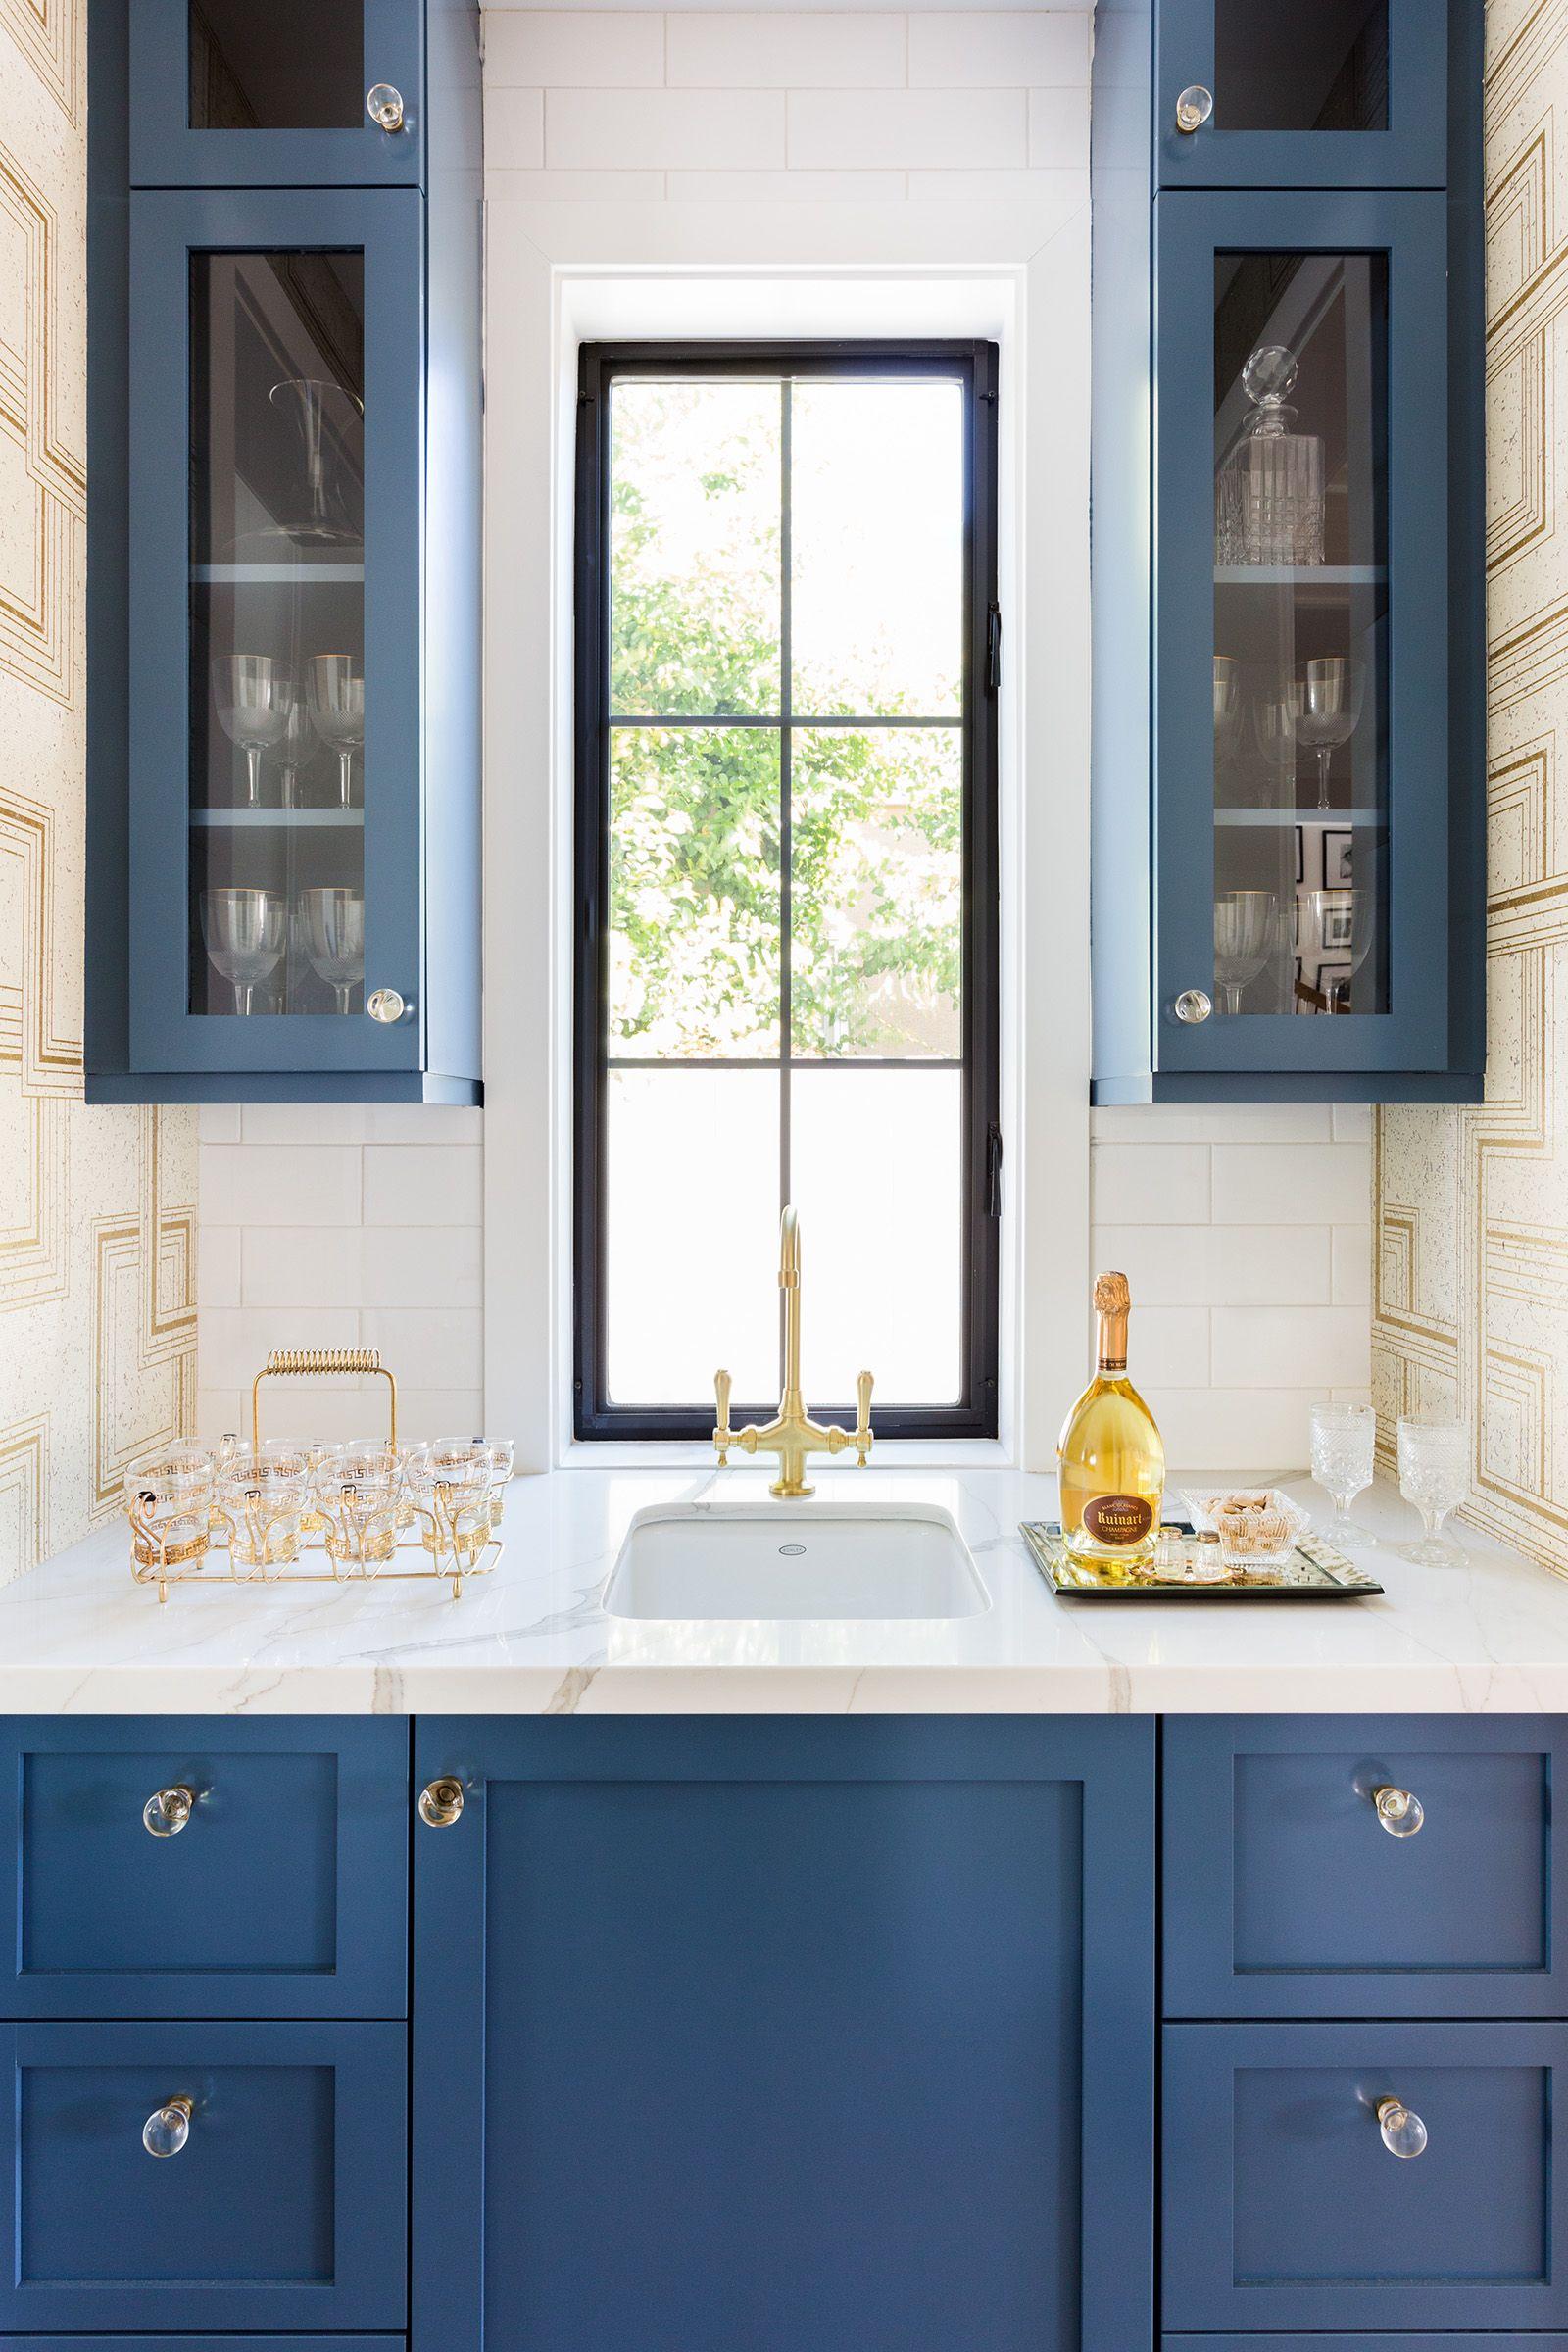 - 30 Best Home Bar Ideas - Cool Home Bar Designs, Furniture, And Decor